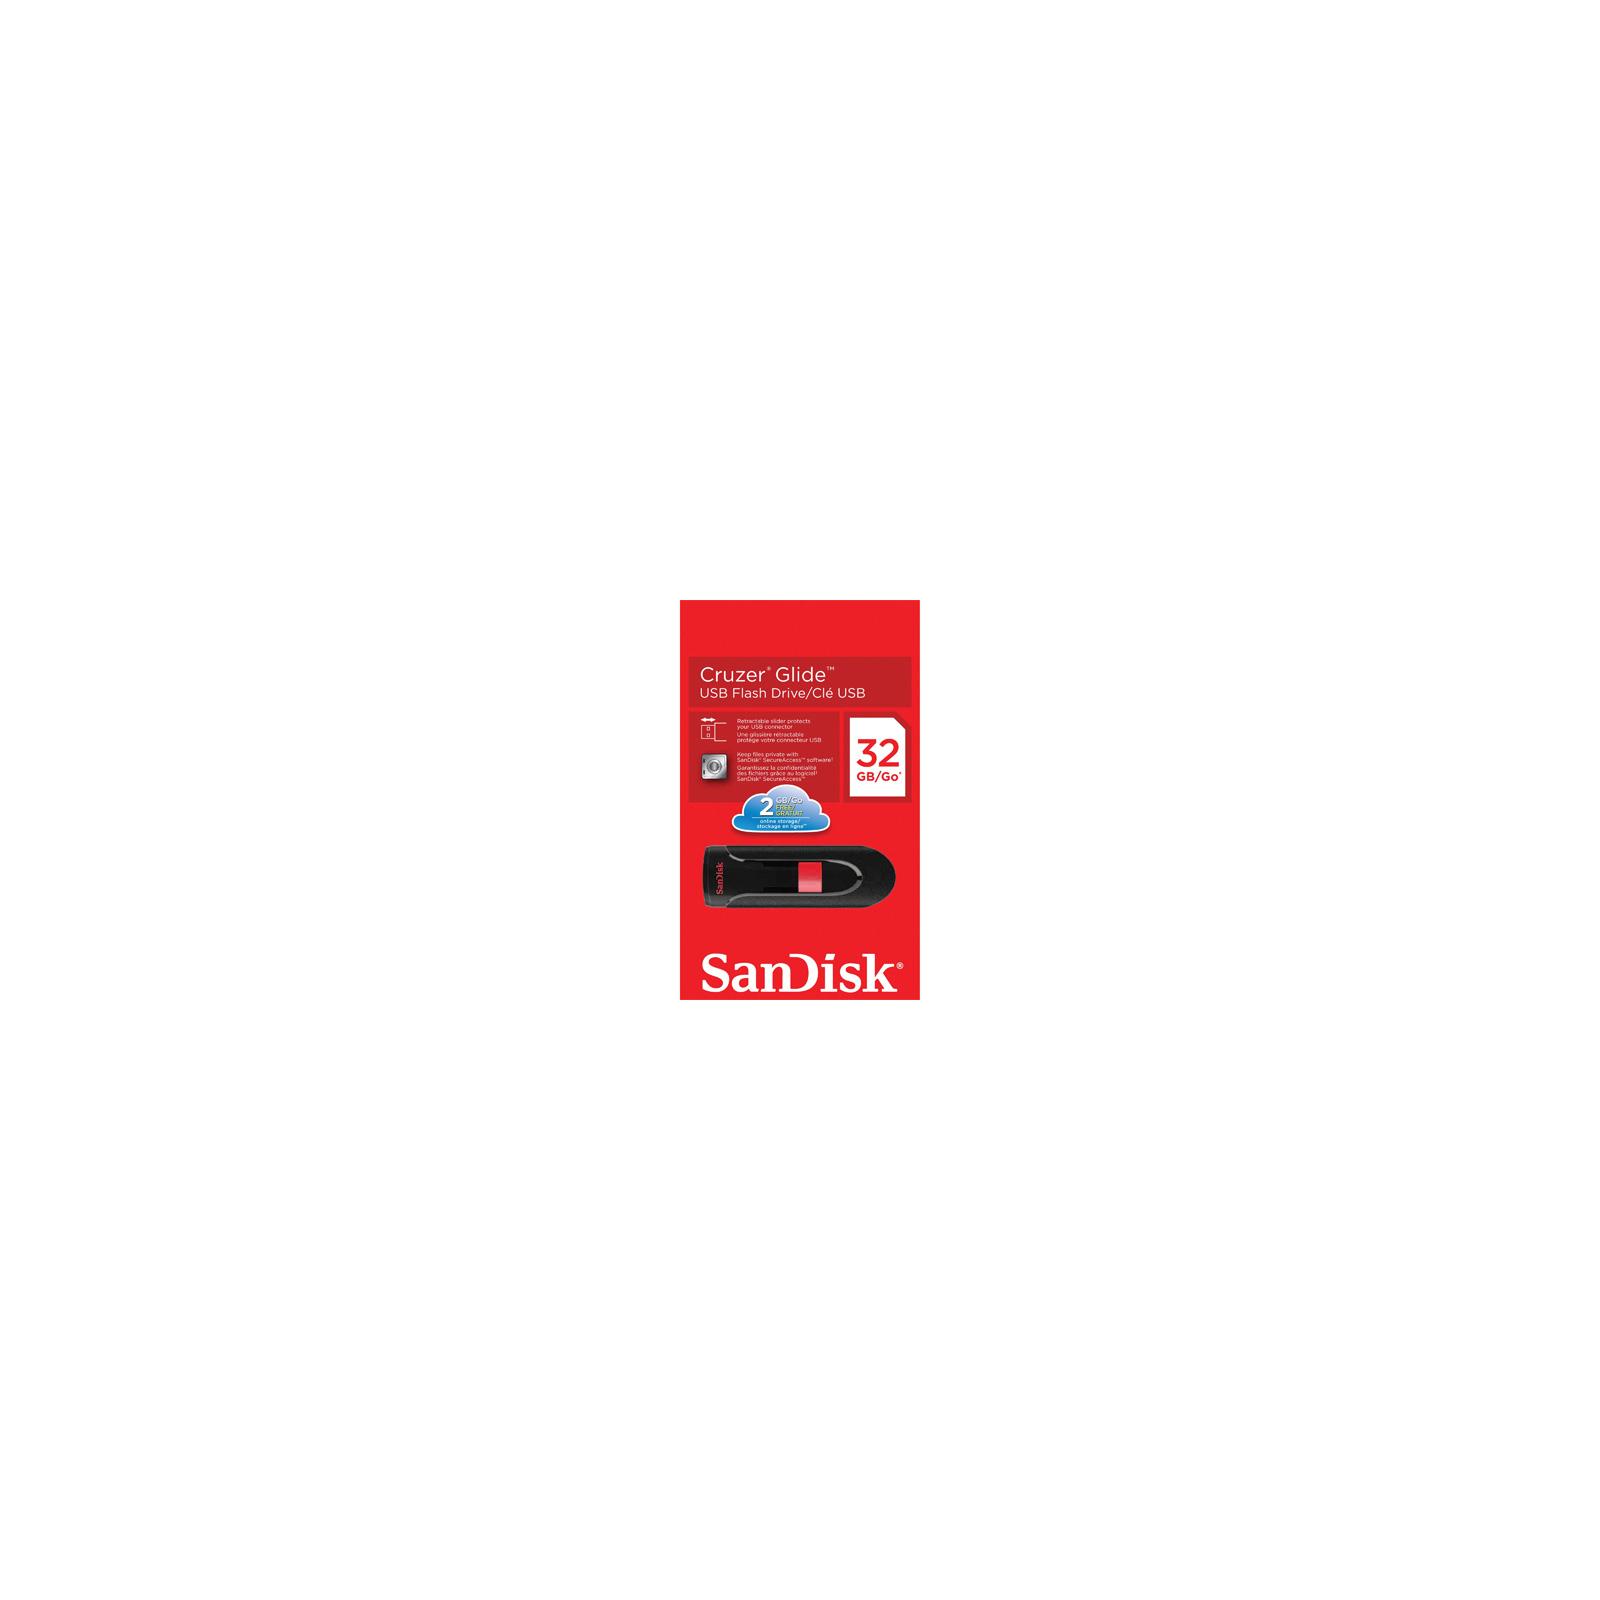 USB флеш накопитель SANDISK 32Gb Cruzer Glide (SDCZ60-032G-B35) изображение 3